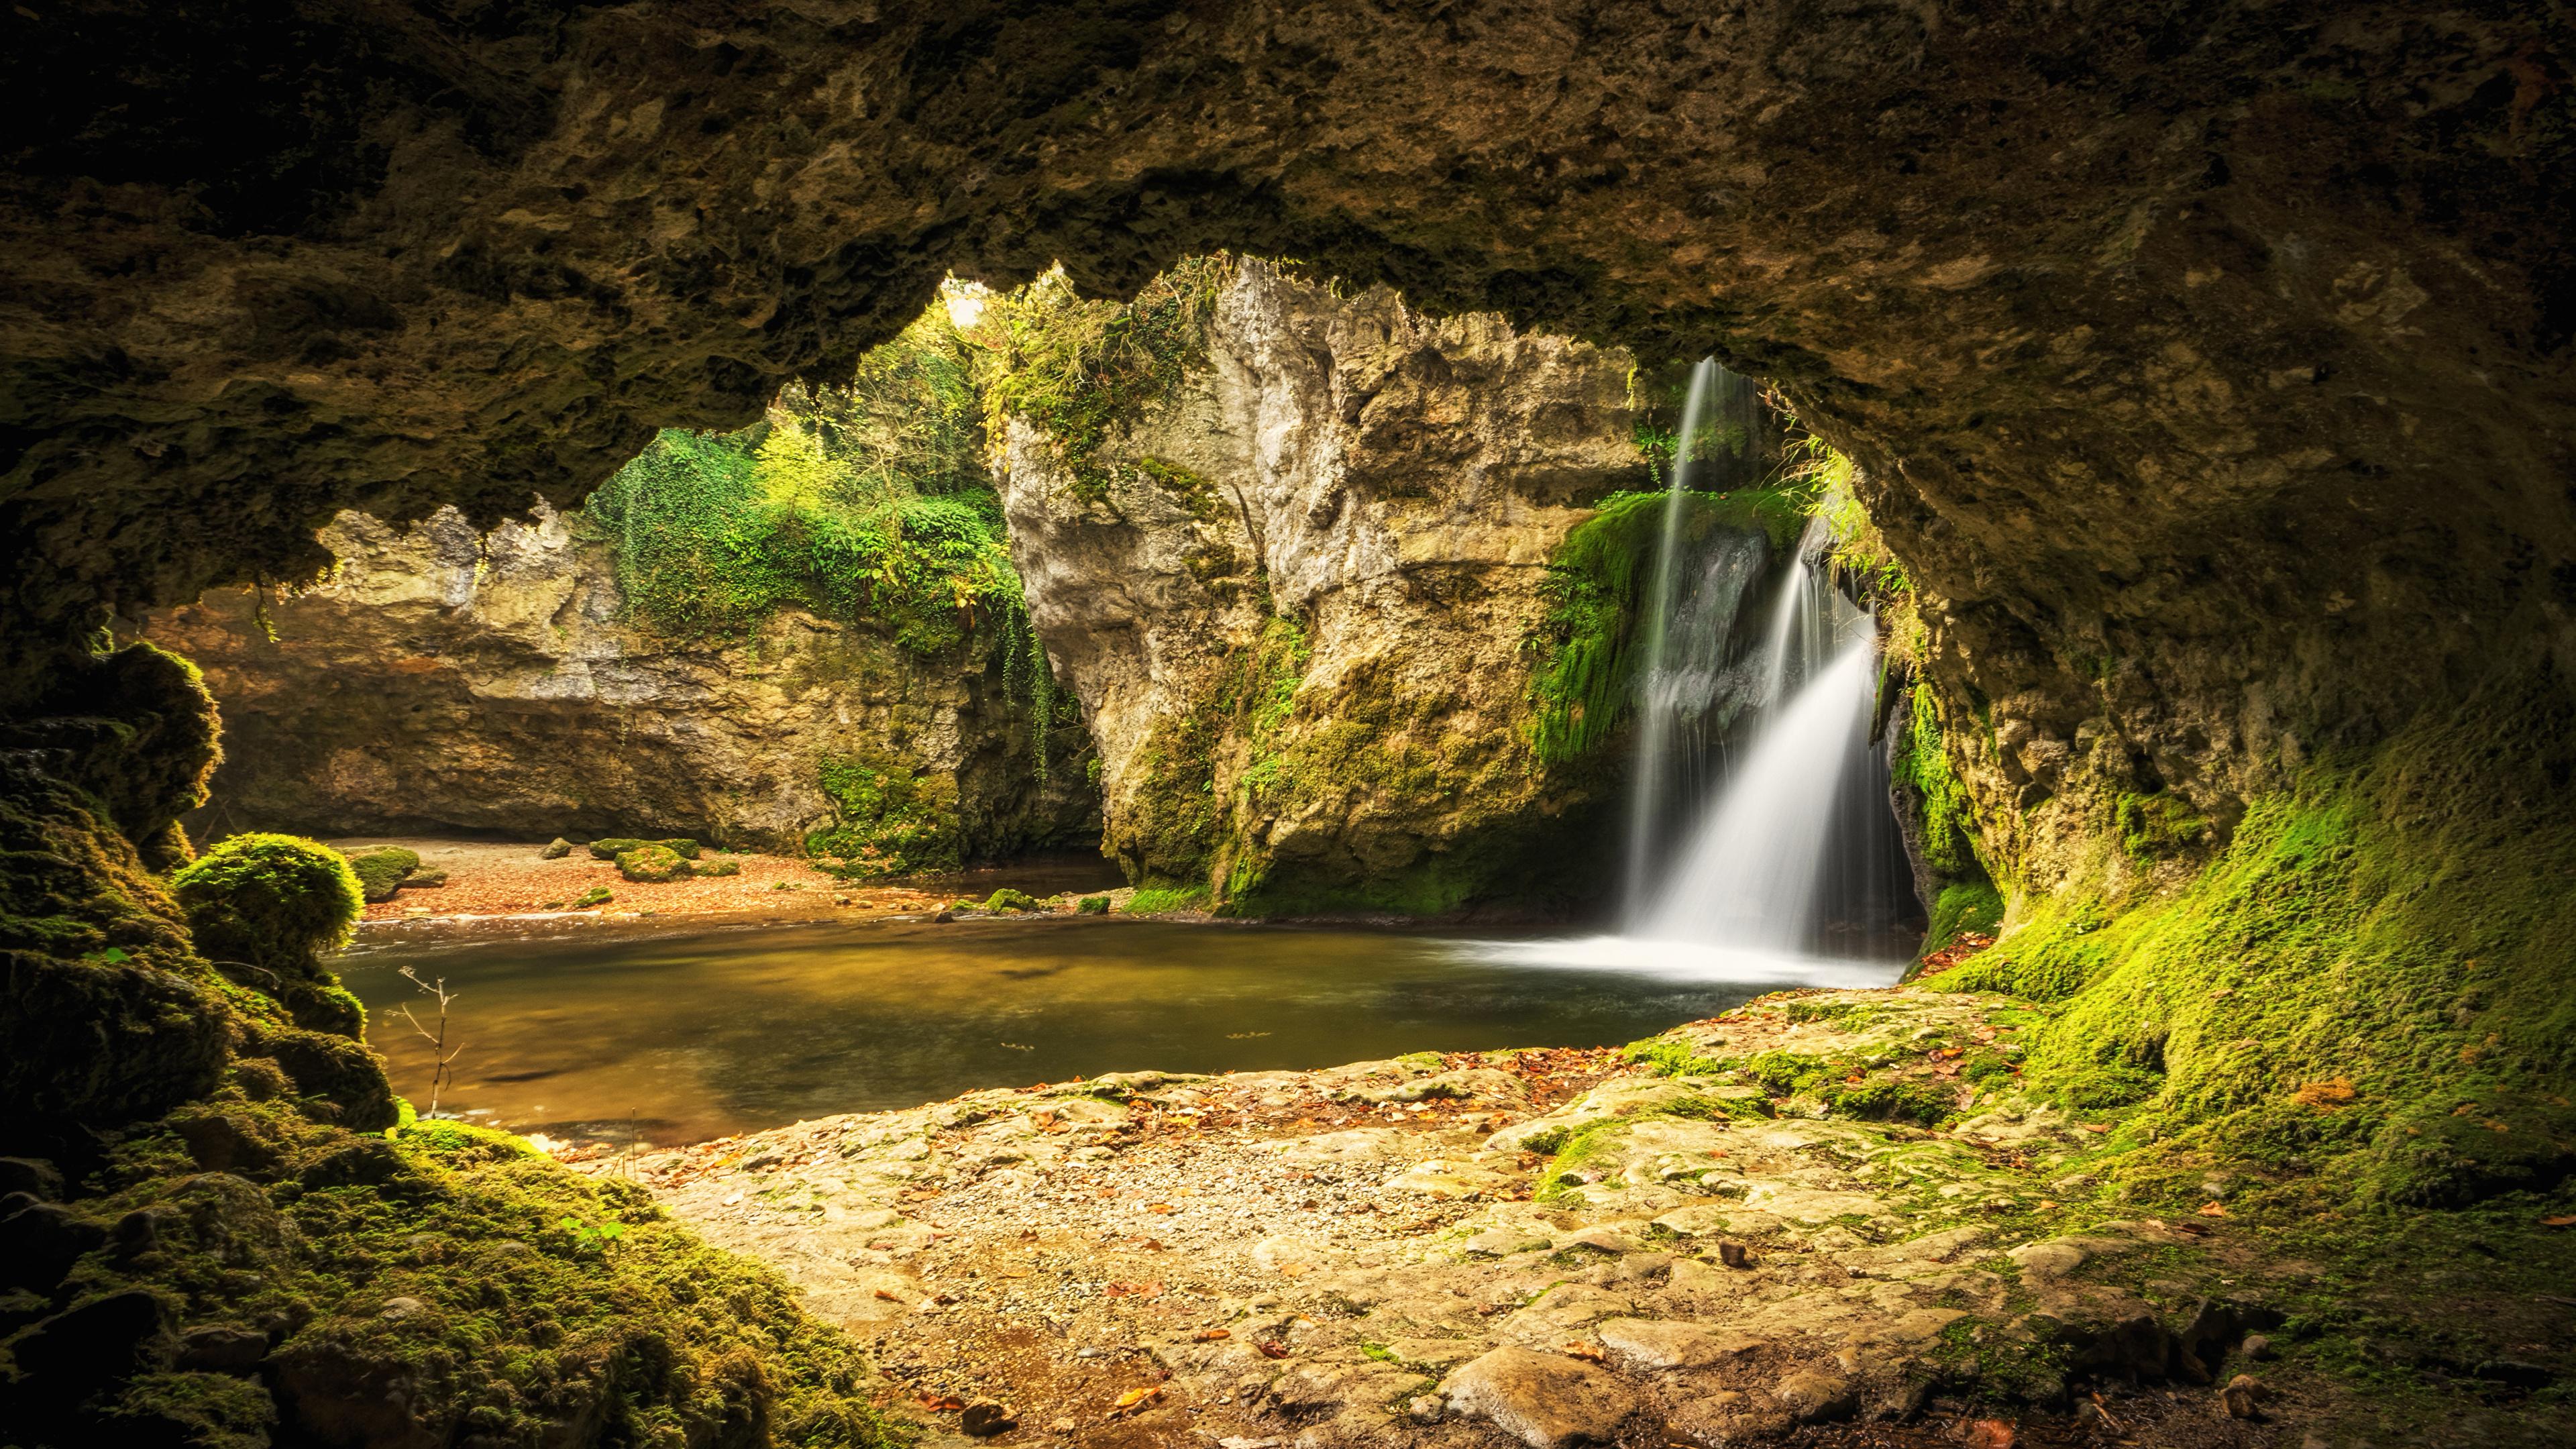 Cueva [bosque de Hermitage] - Página 2 Switzerland_Rivers_Waterfalls_Venoge_Cave_Moss_541760_3840x2160